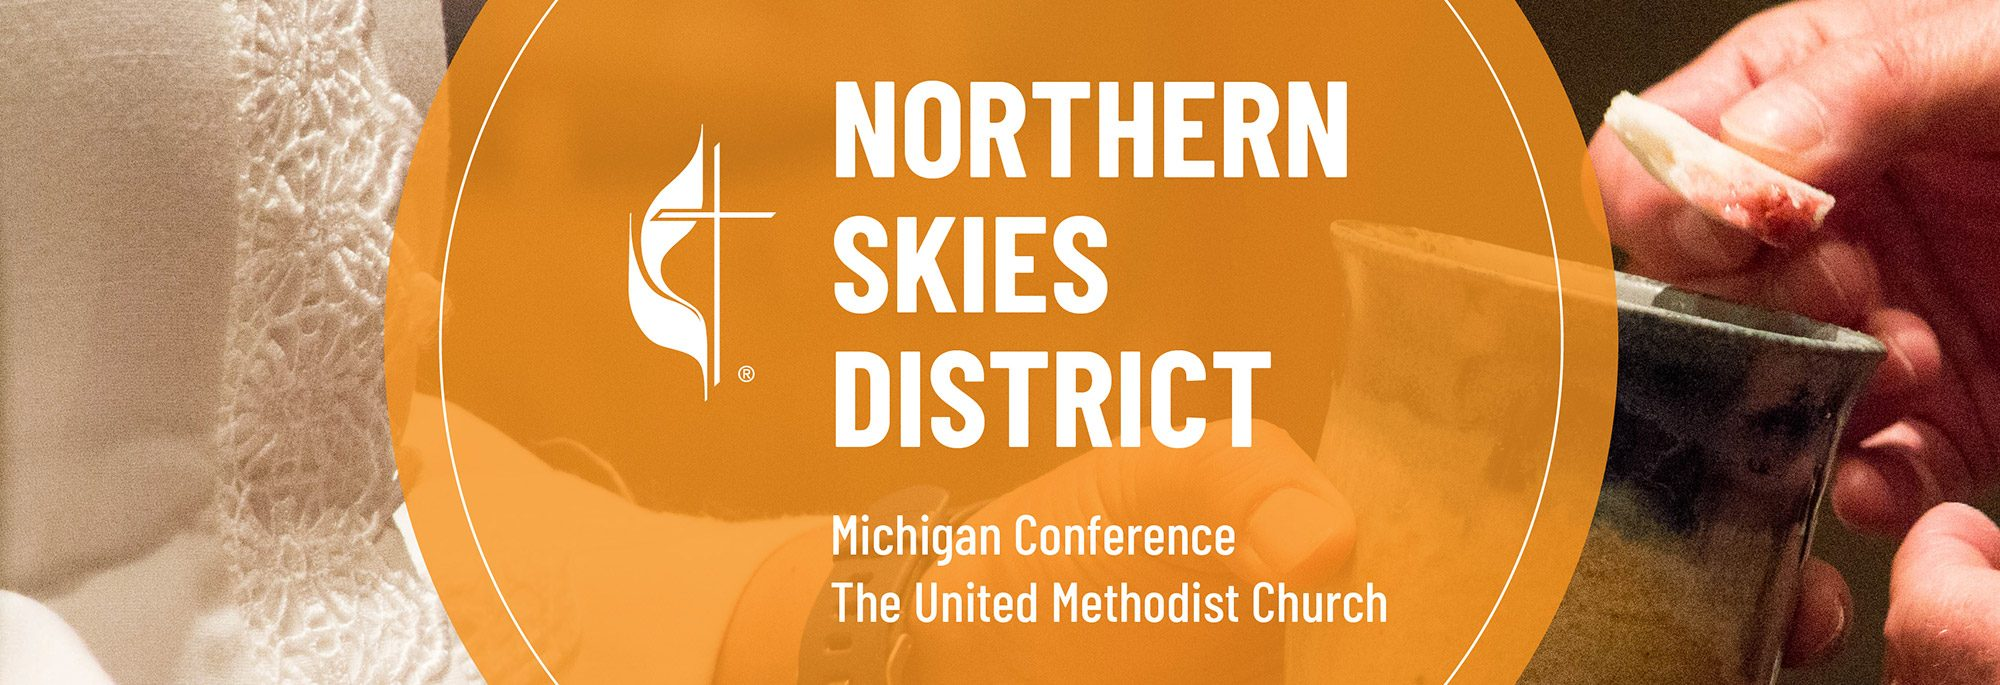 Northern Skies District Logo